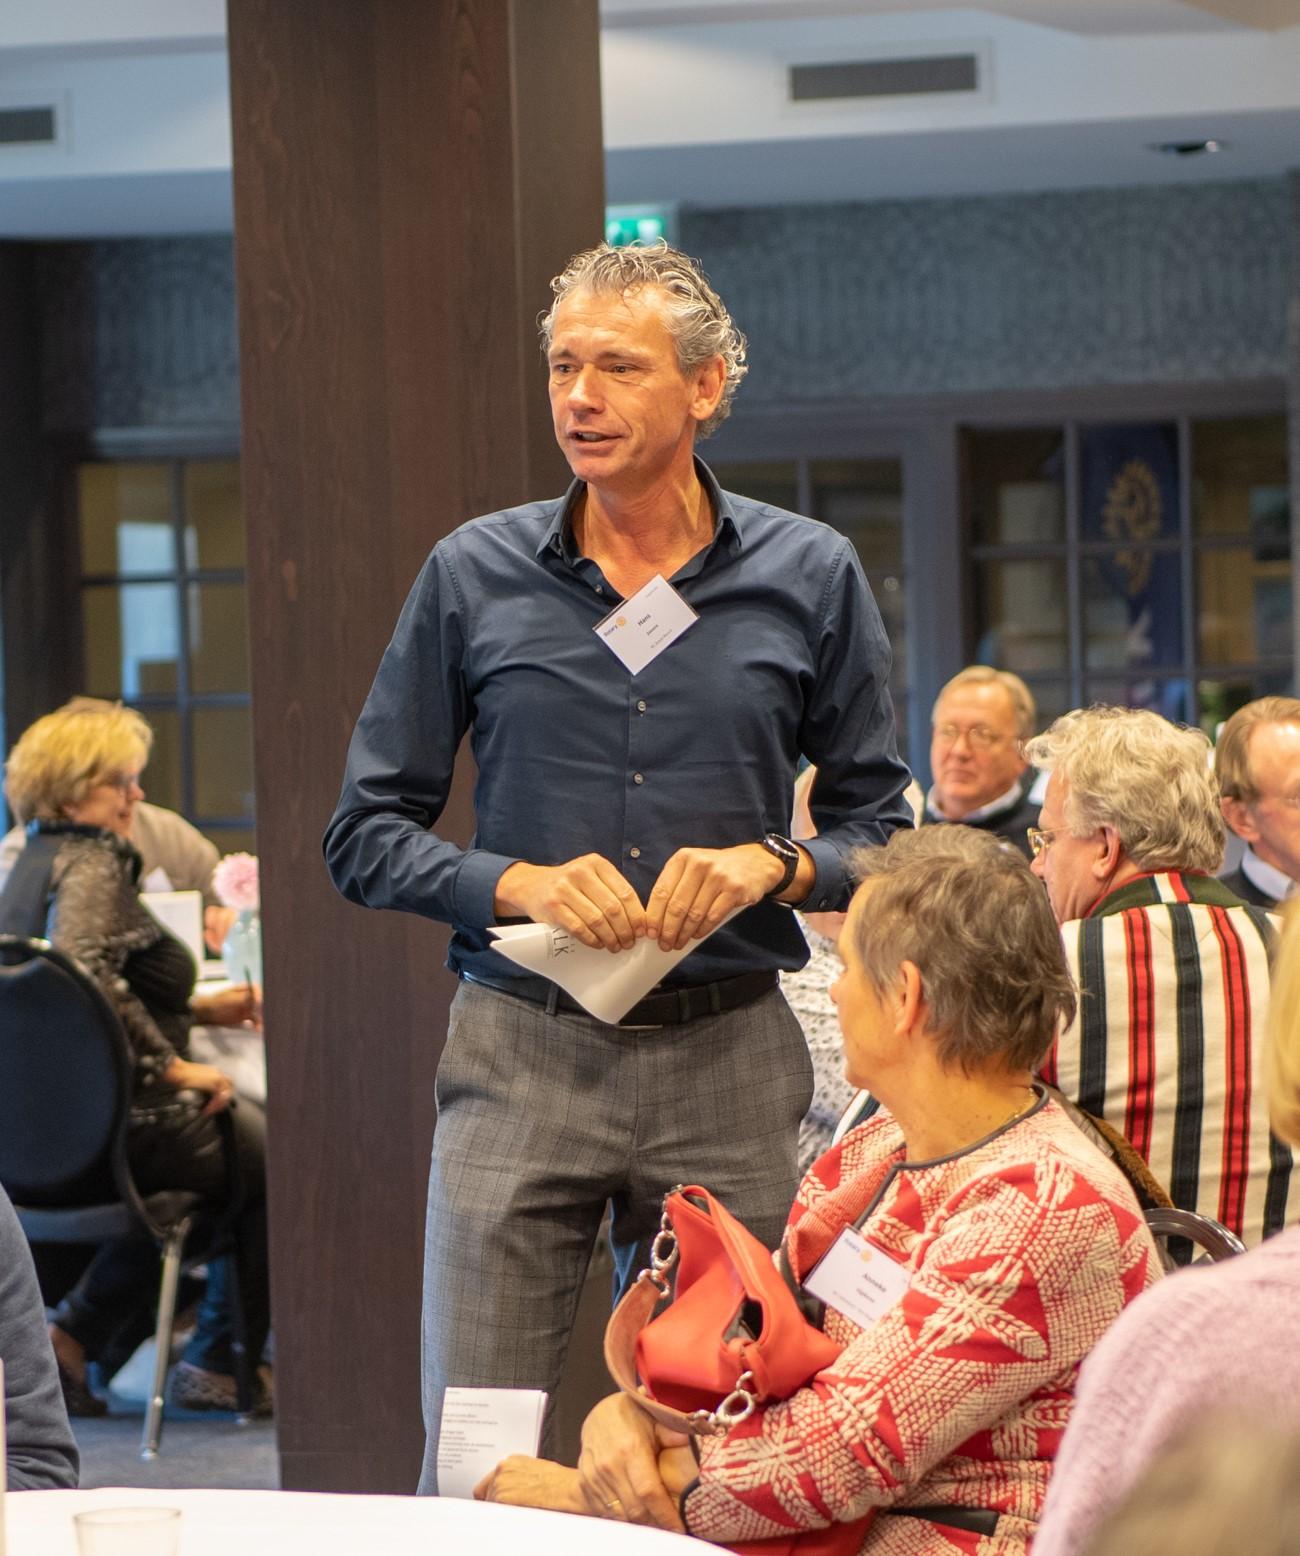 https://www.discon-d1590.nl/wp-content/uploads/2019/02/Hans-Jansen.jpg